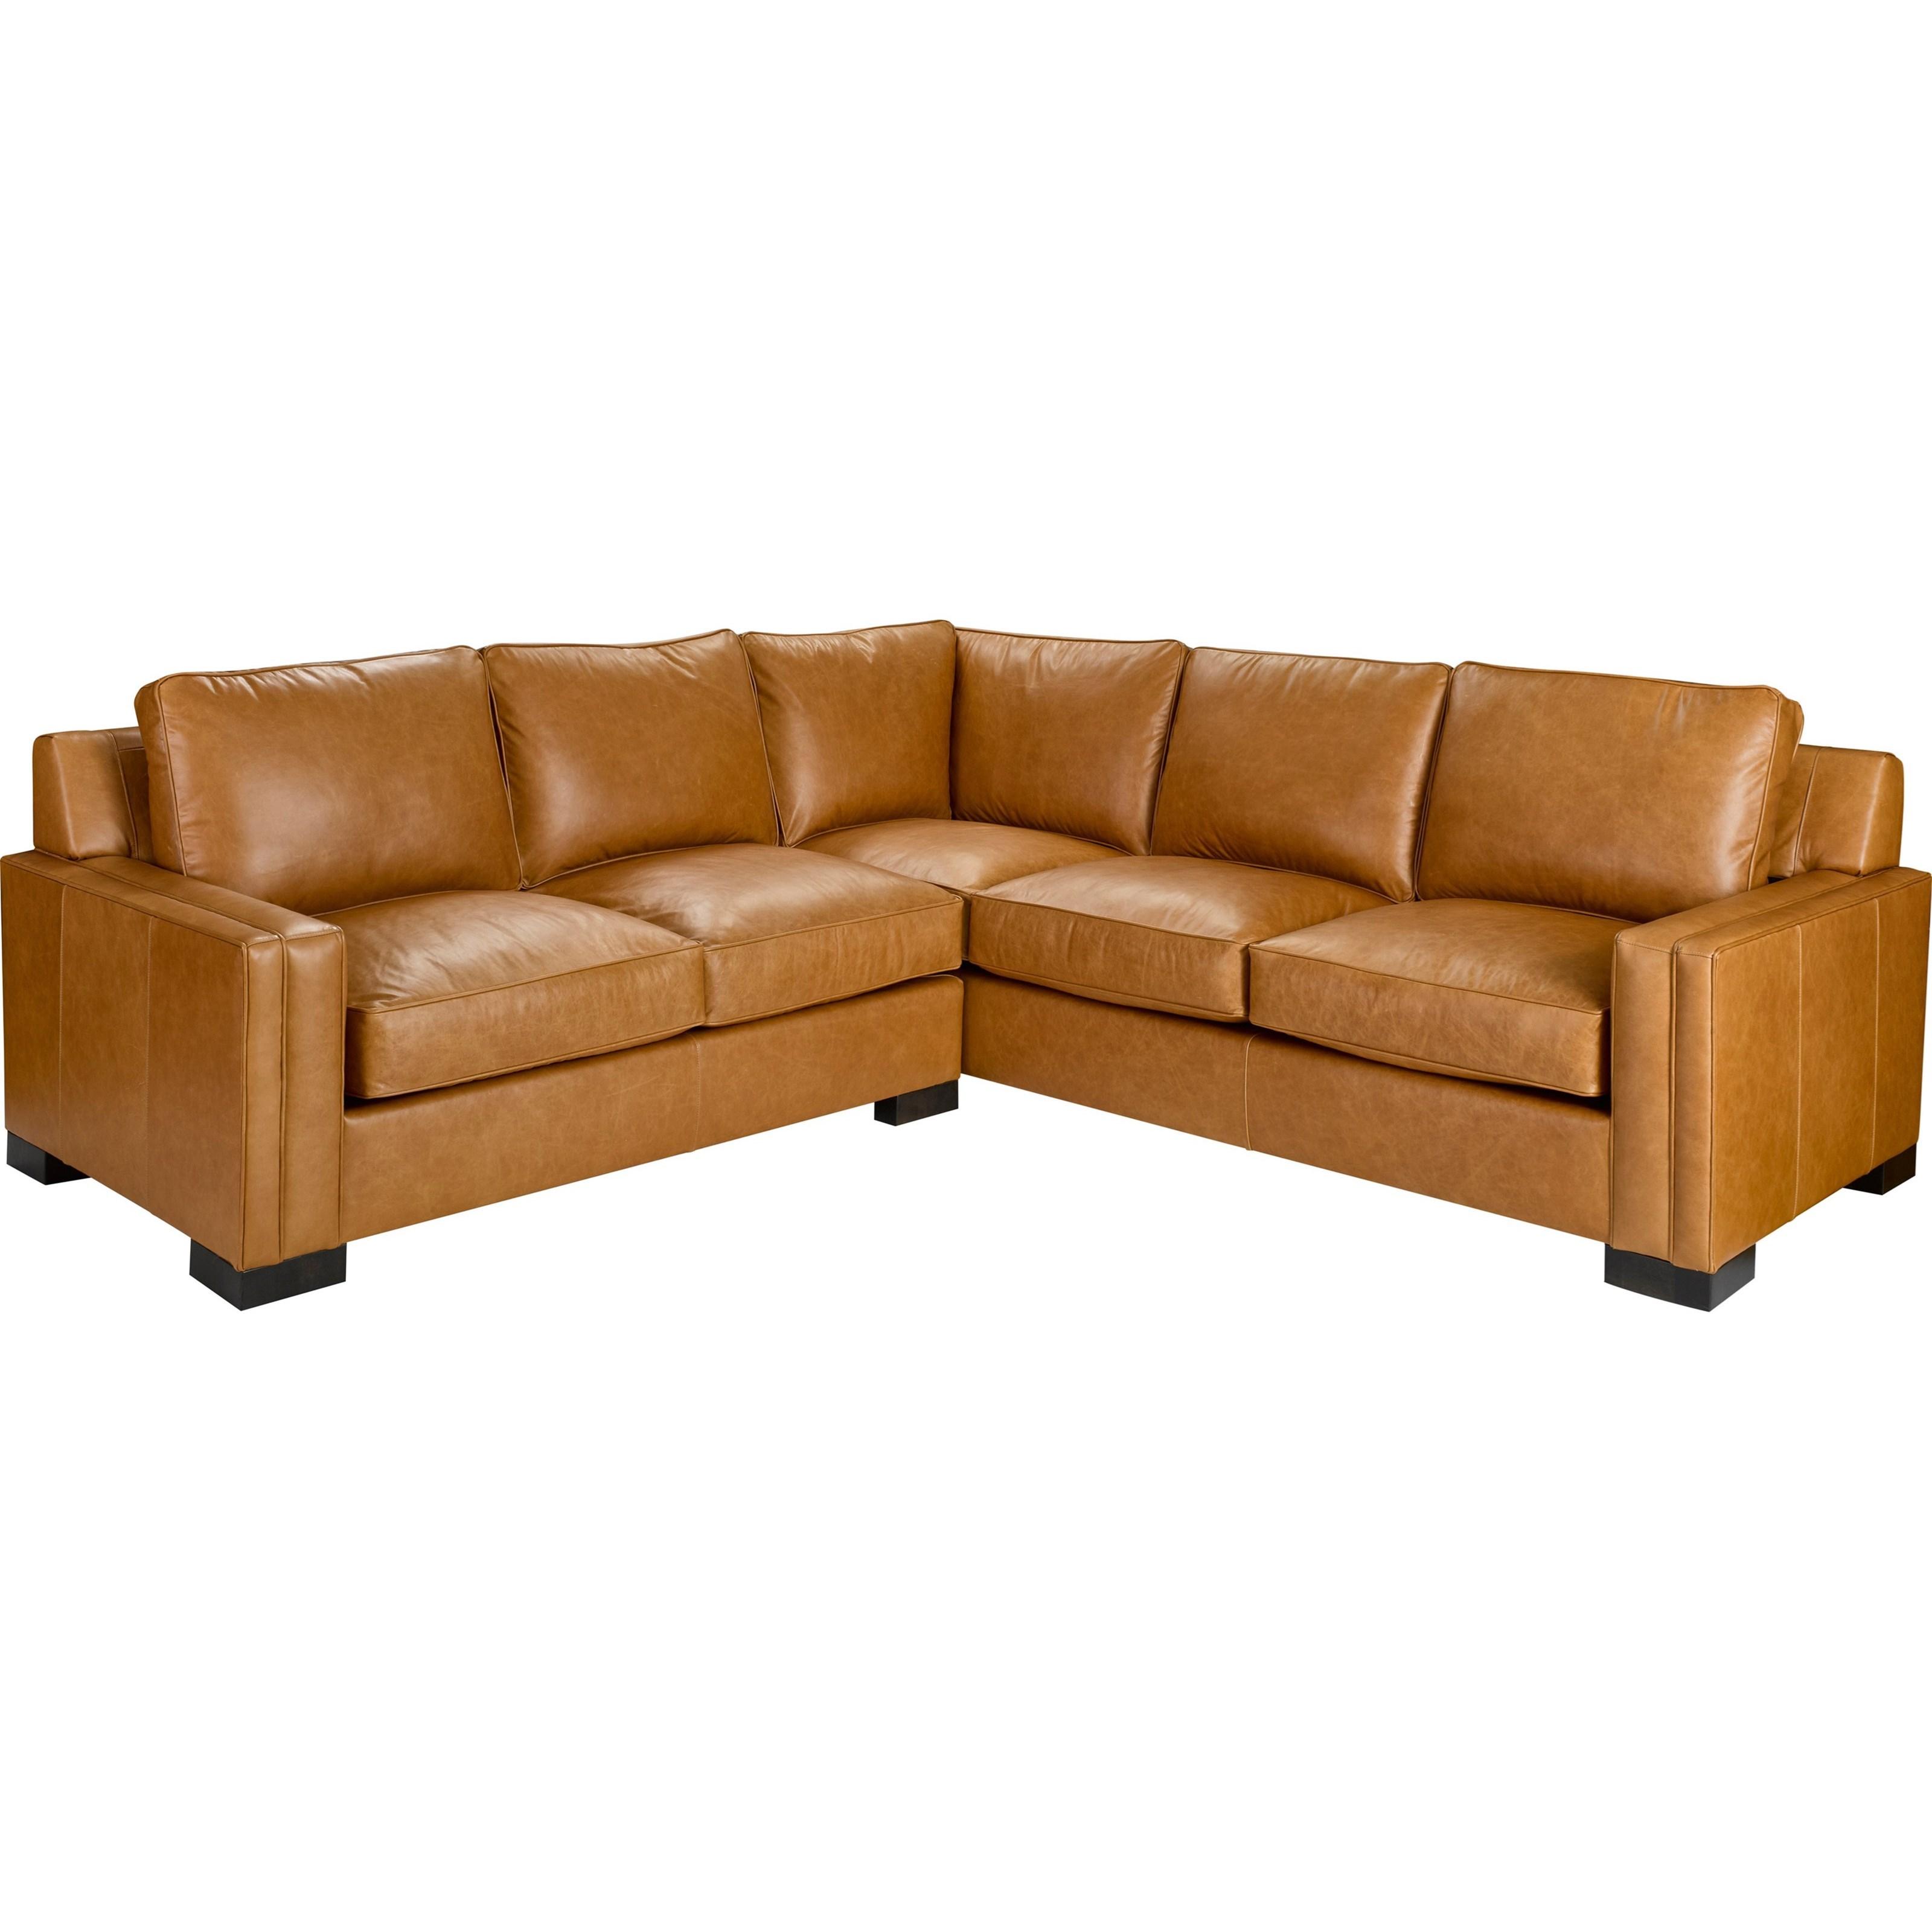 Broyhill Furniture Rocco 2 Piece Sectional With Corner Sofa John V Schultz Furniture